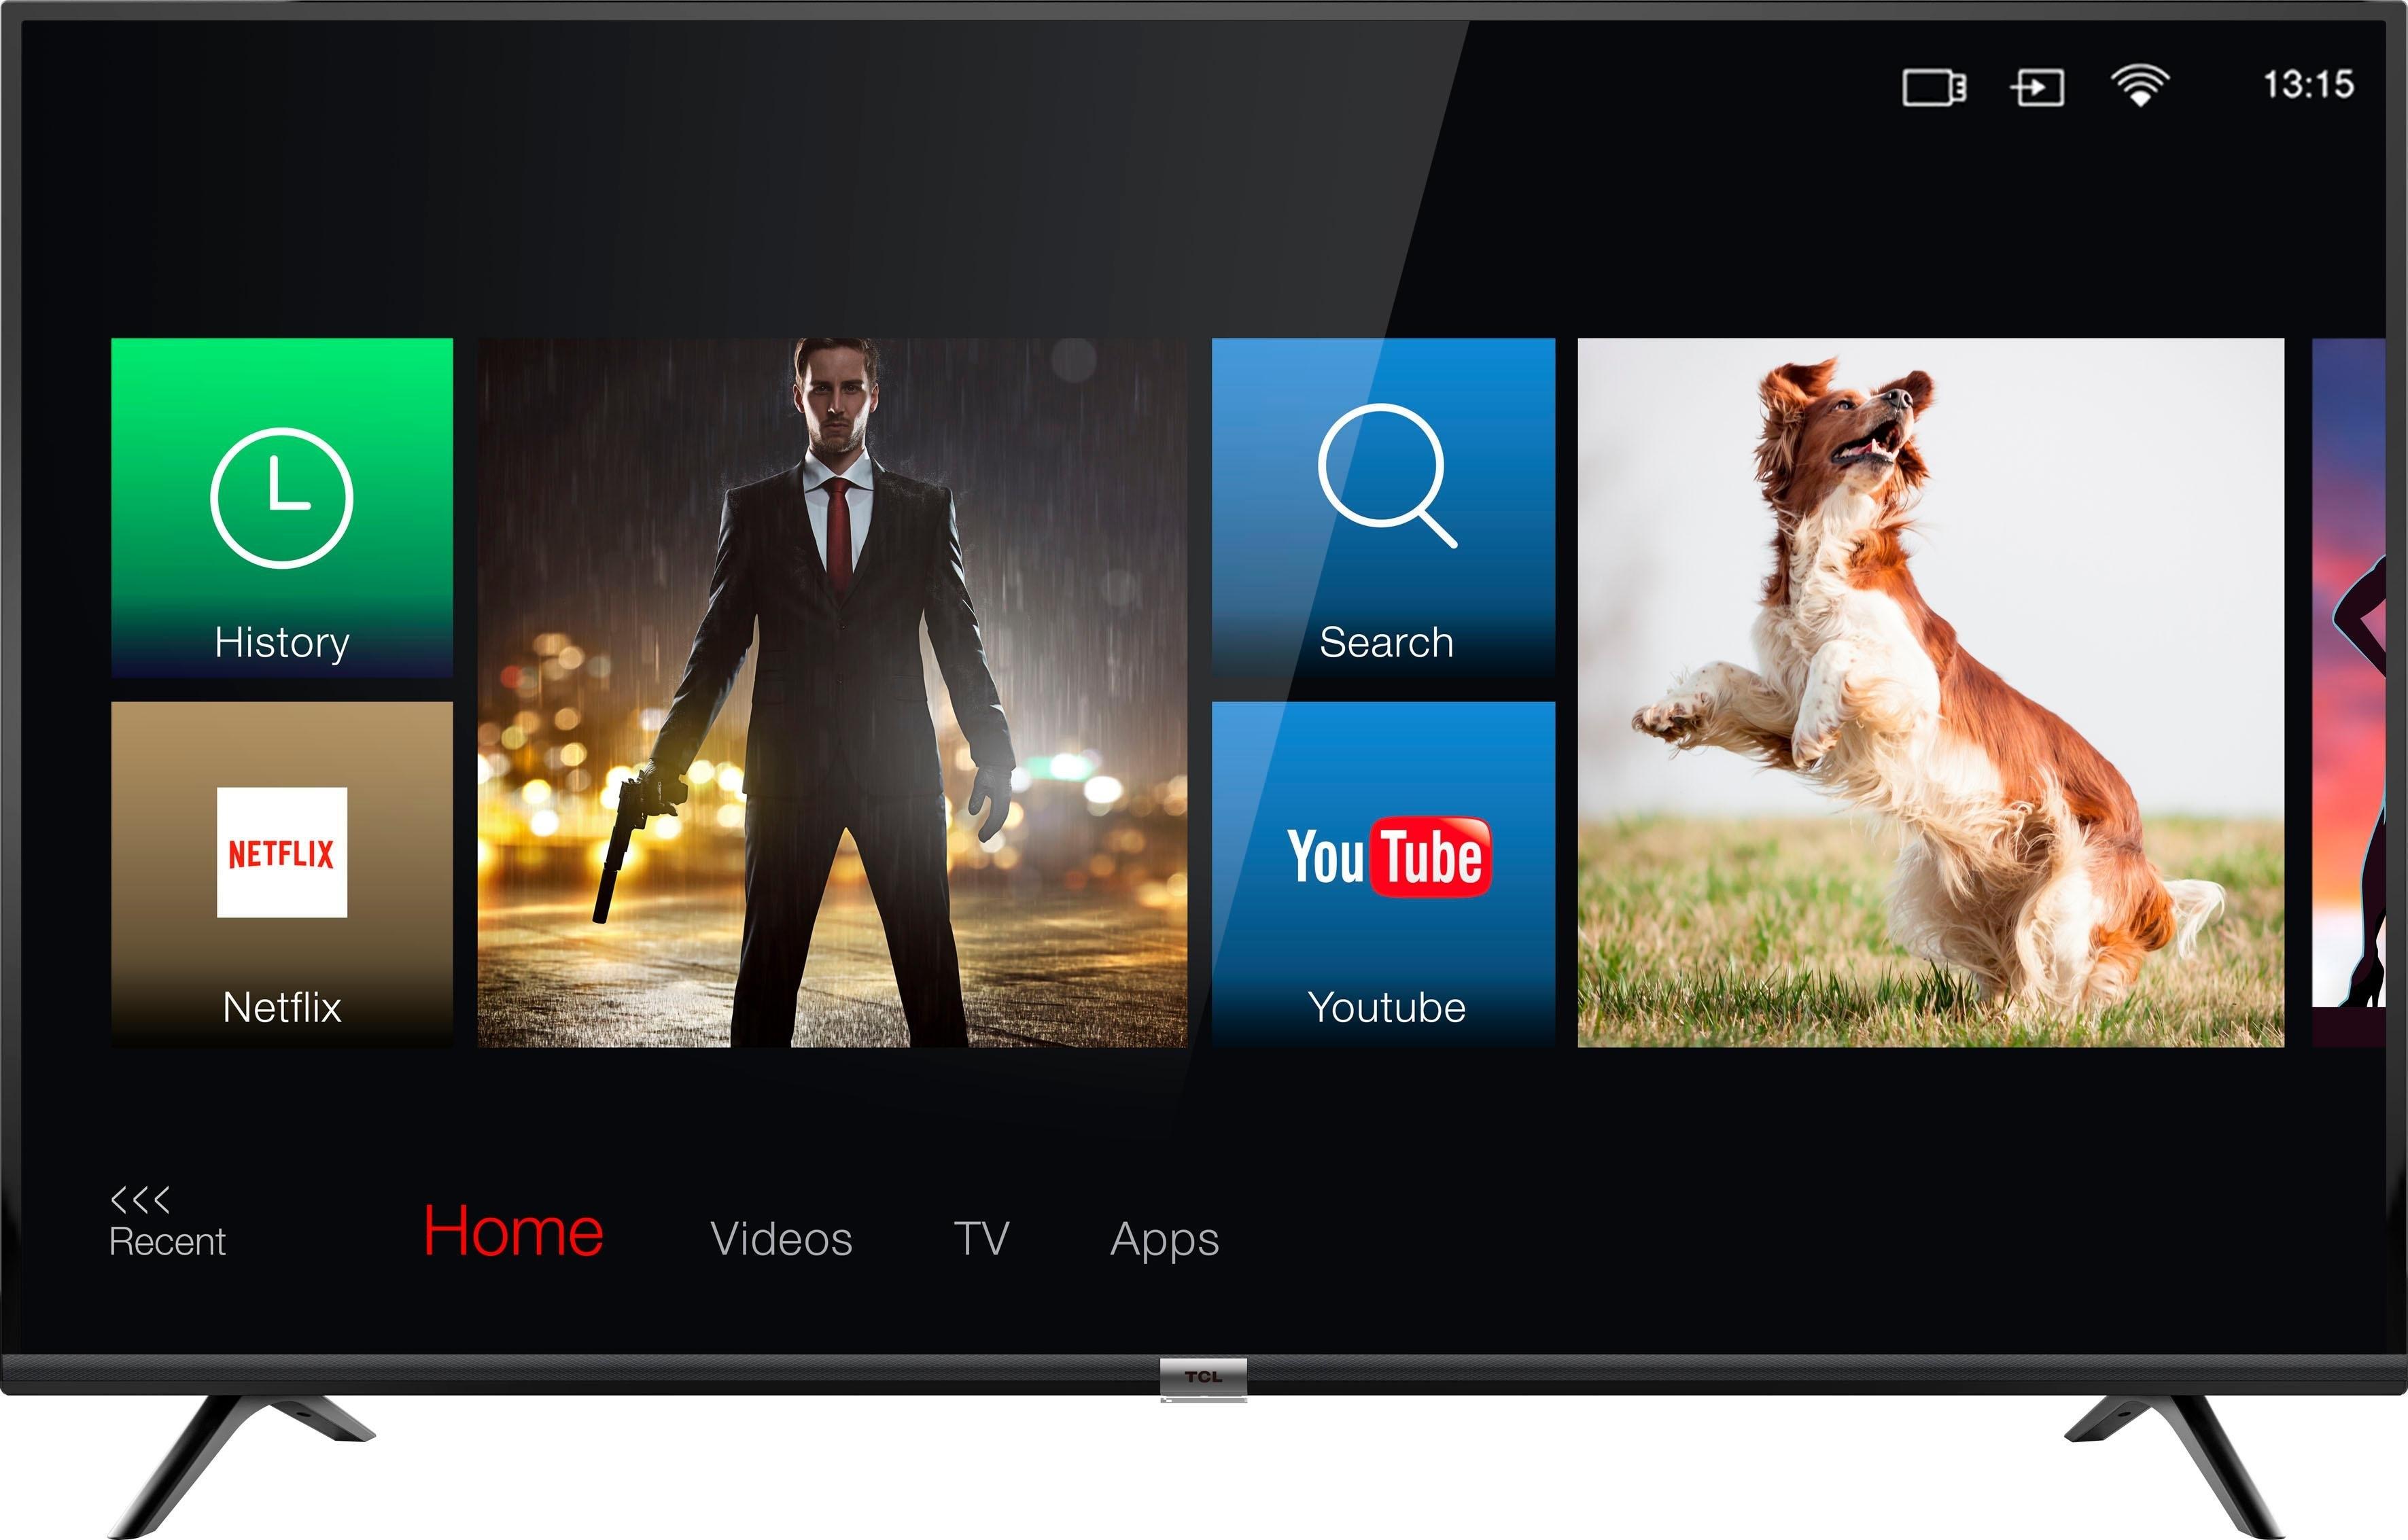 Tcl 55DB600 led-tv (139,7 cm / 55 inch), 4K Ultra HD, smart-tv - gratis ruilen op otto.nl